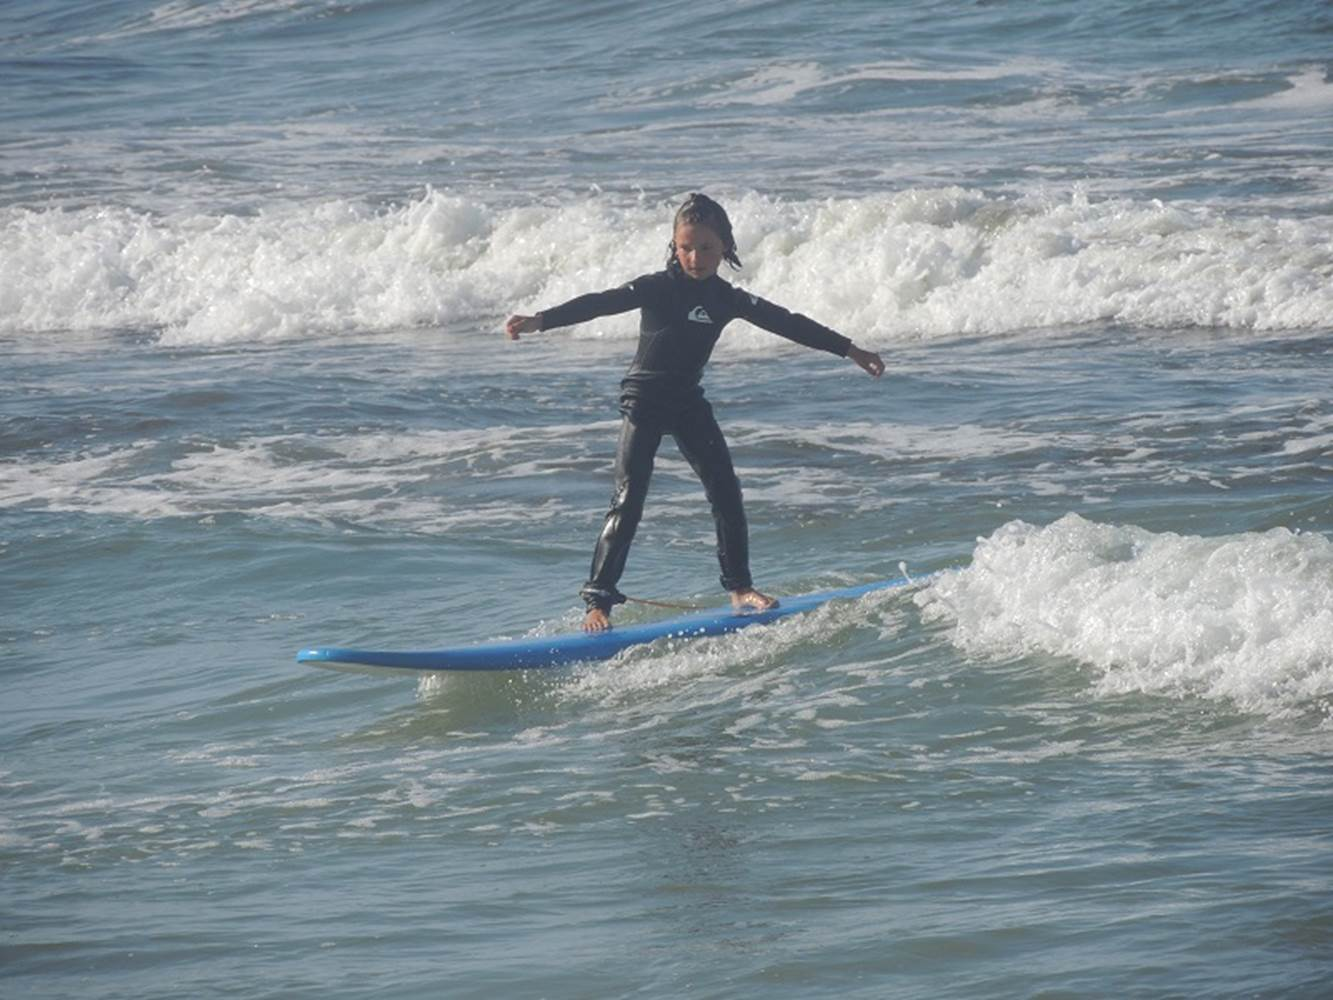 Ecole-de-surf-Plouhinec-Morbihan-Bretagne-Sud ©